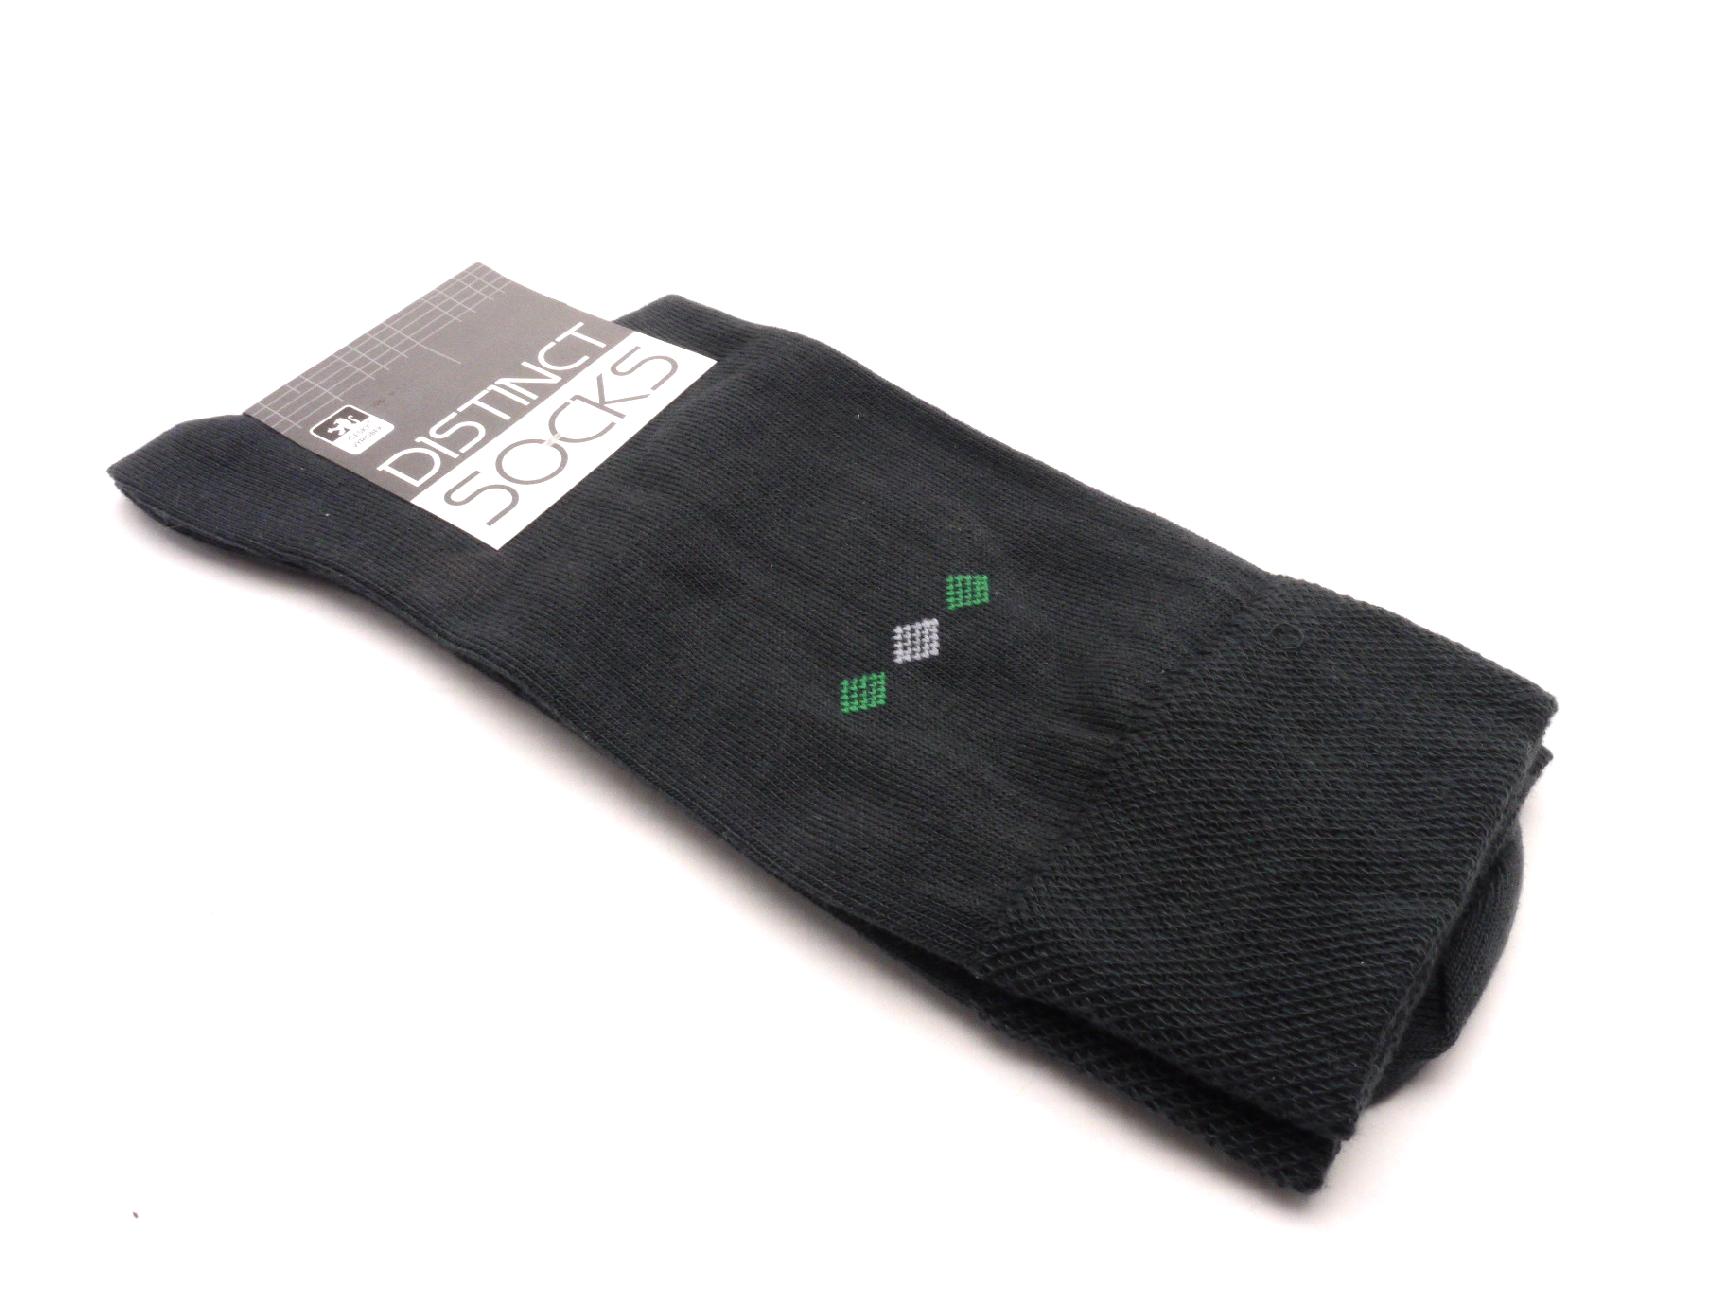 Tapo Ponožky distinct šedá kosočtverec zelený velikost: 43-46